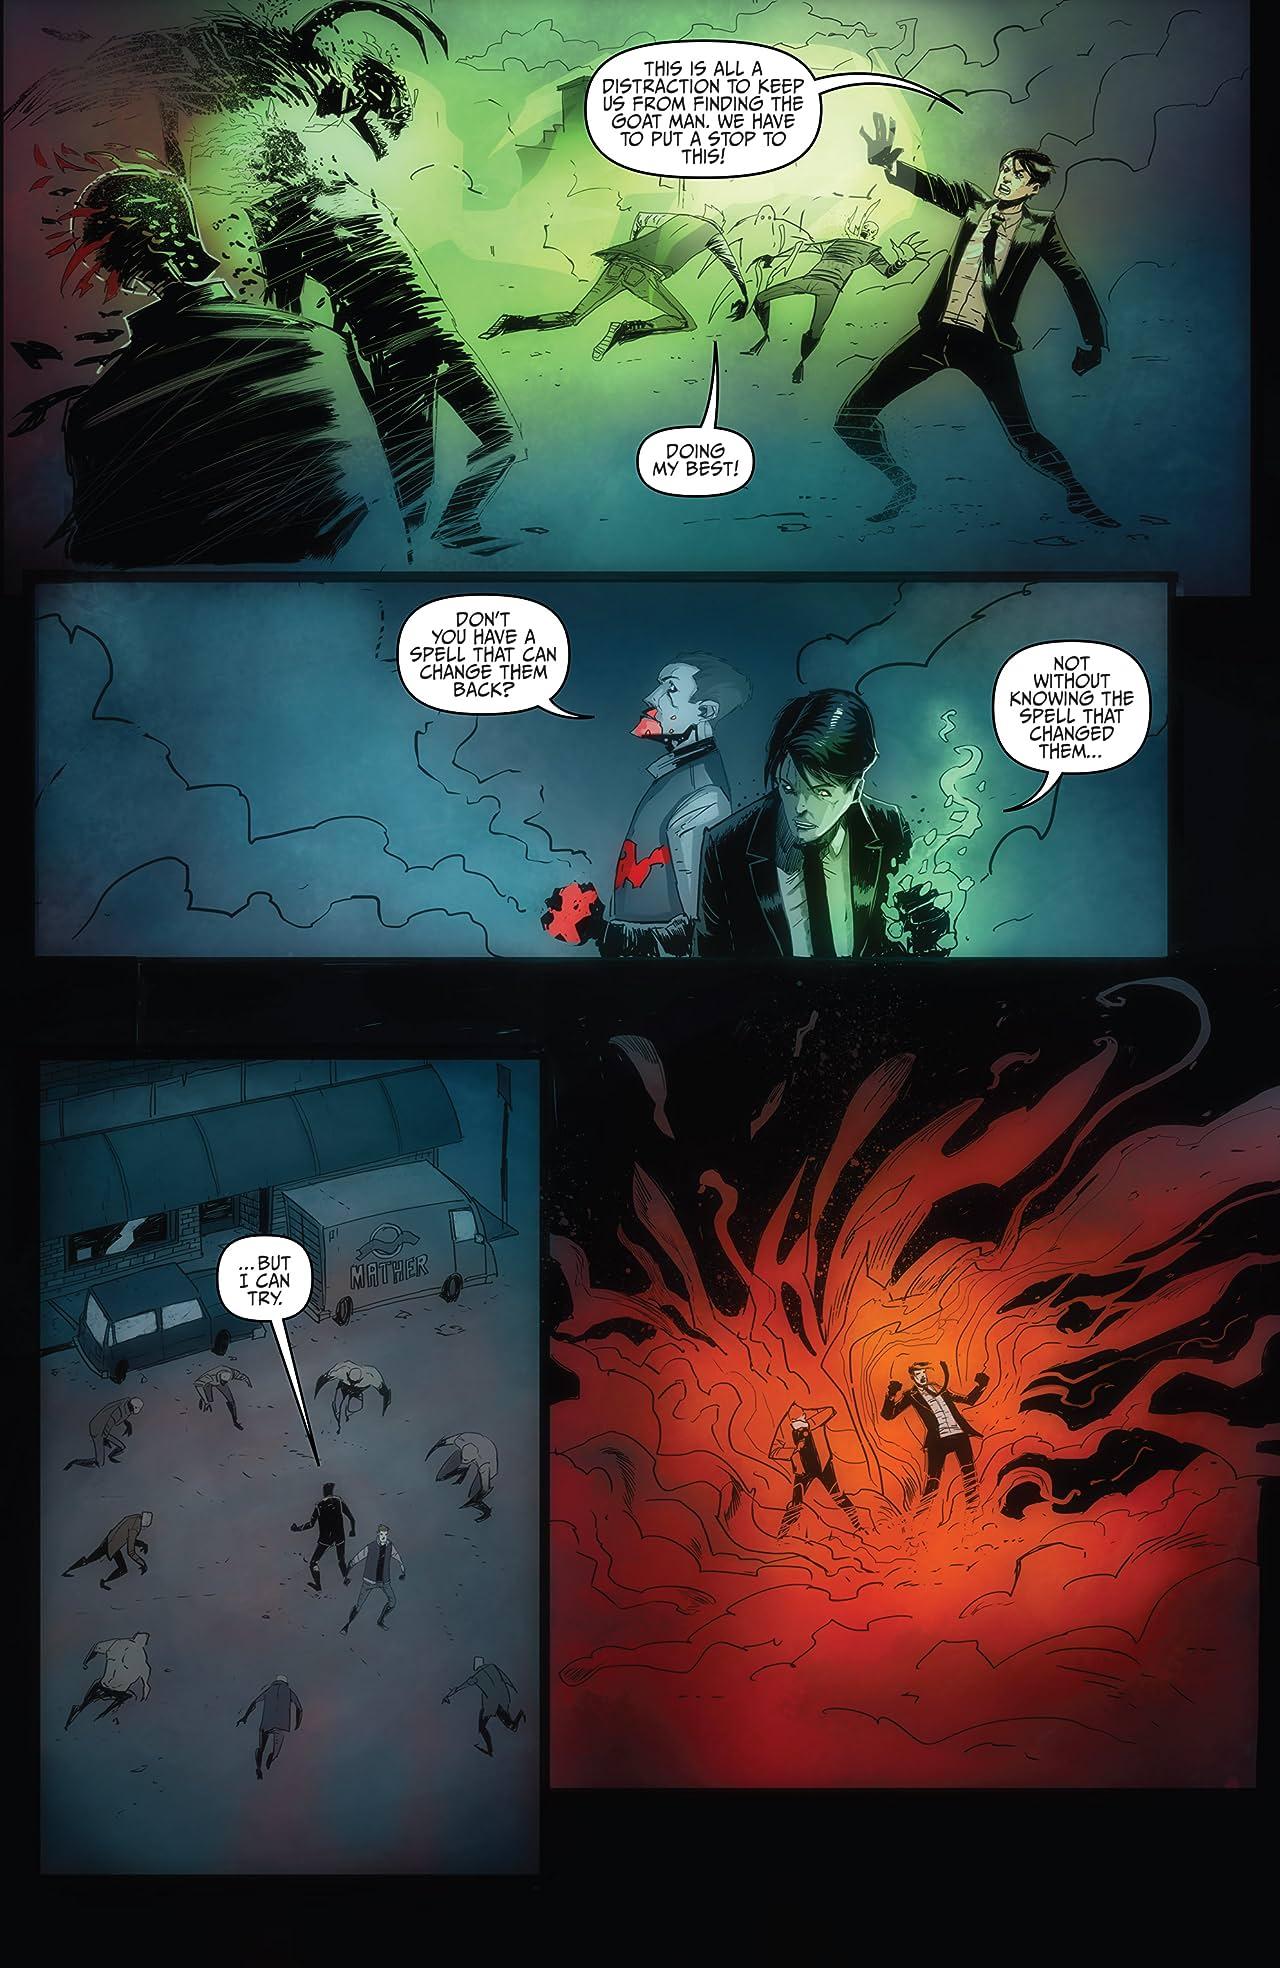 The October Faction: Supernatural Dreams #3